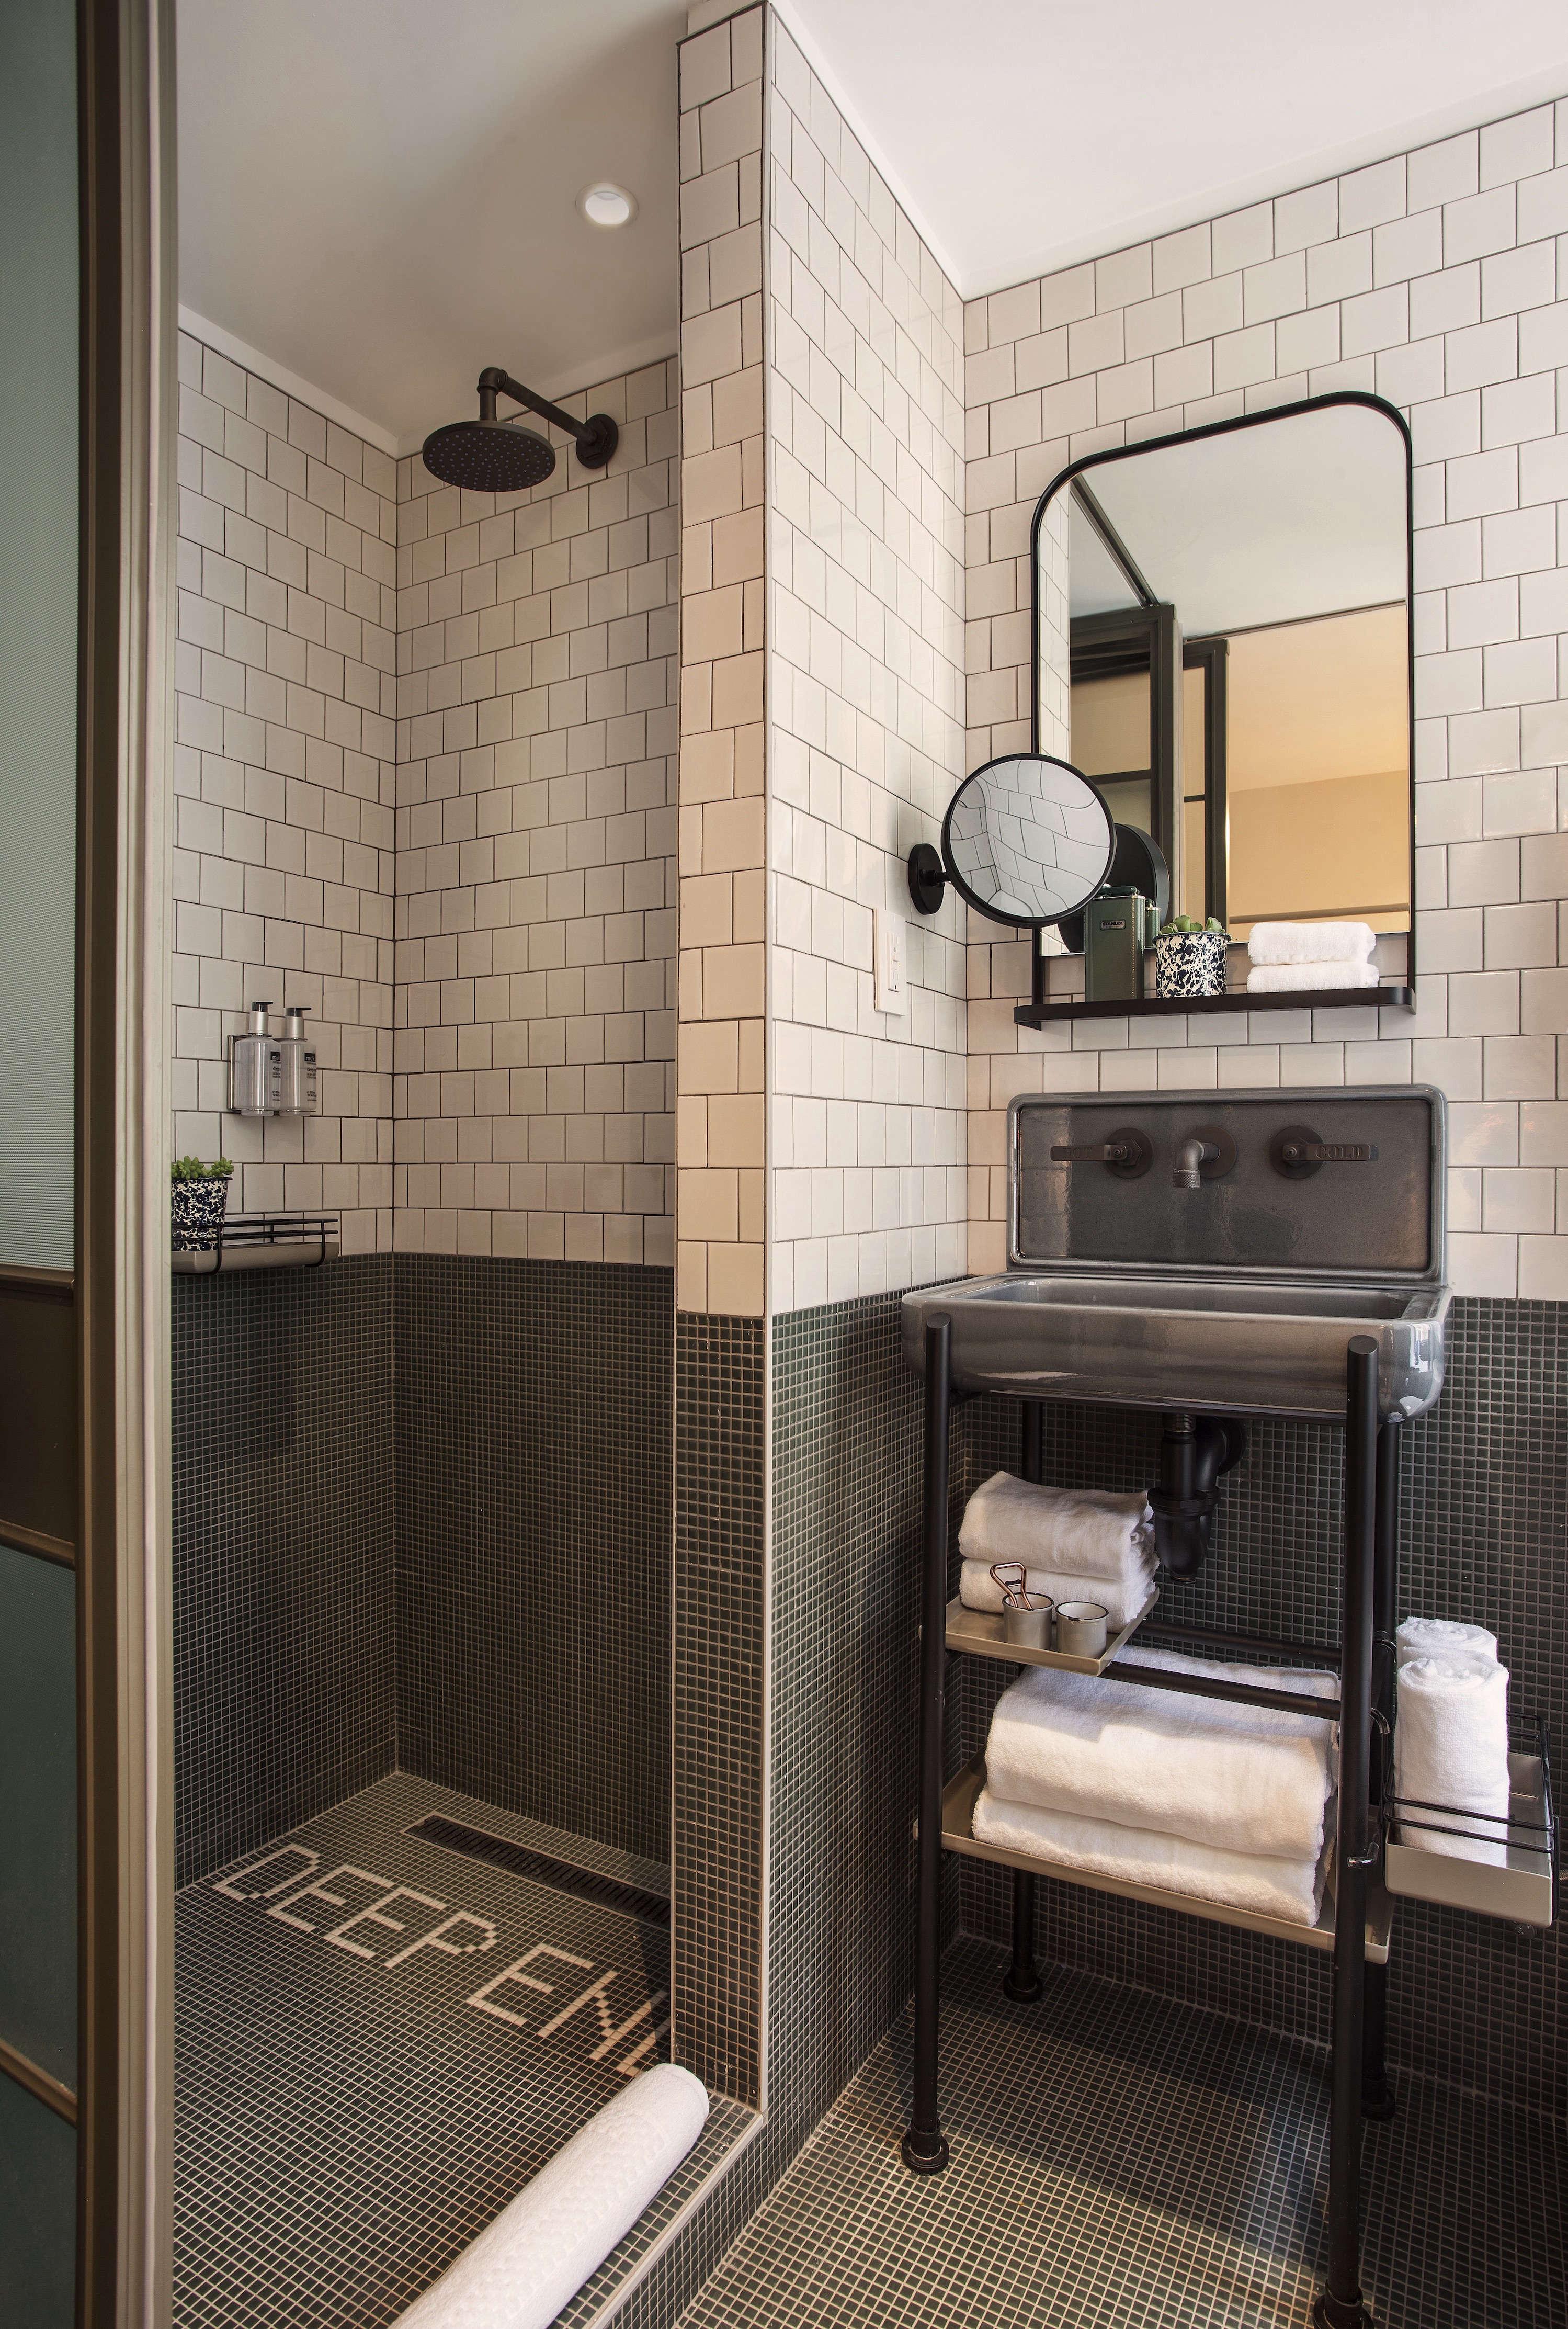 Moxy Hotel NYC, bathroom with in-room sink, Yabu Pushelberg design.